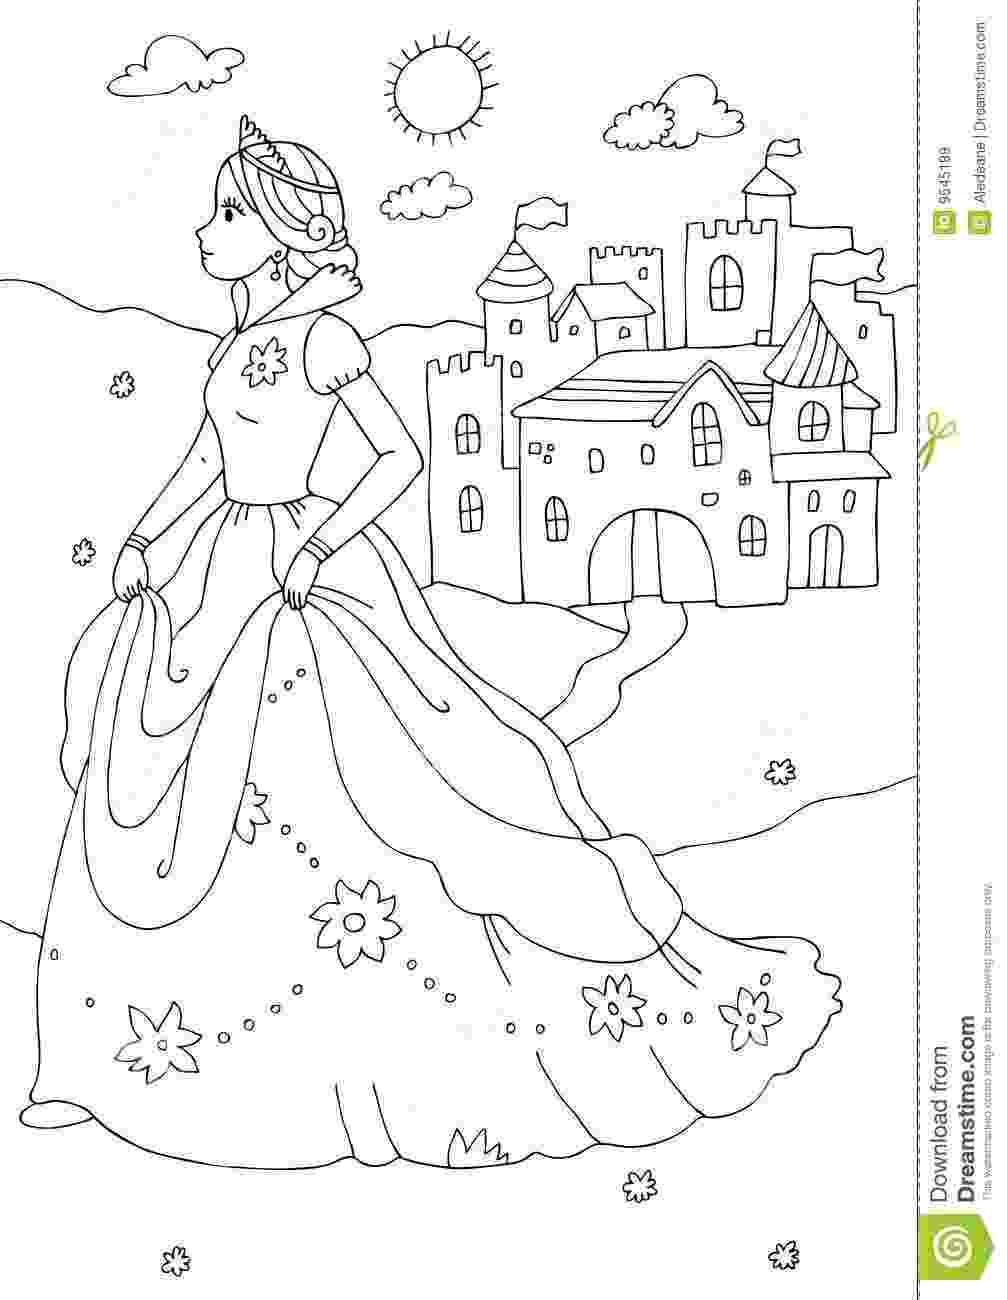 princess castle colouring pages new disney coloring pages princess cinderella castle castle colouring pages princess